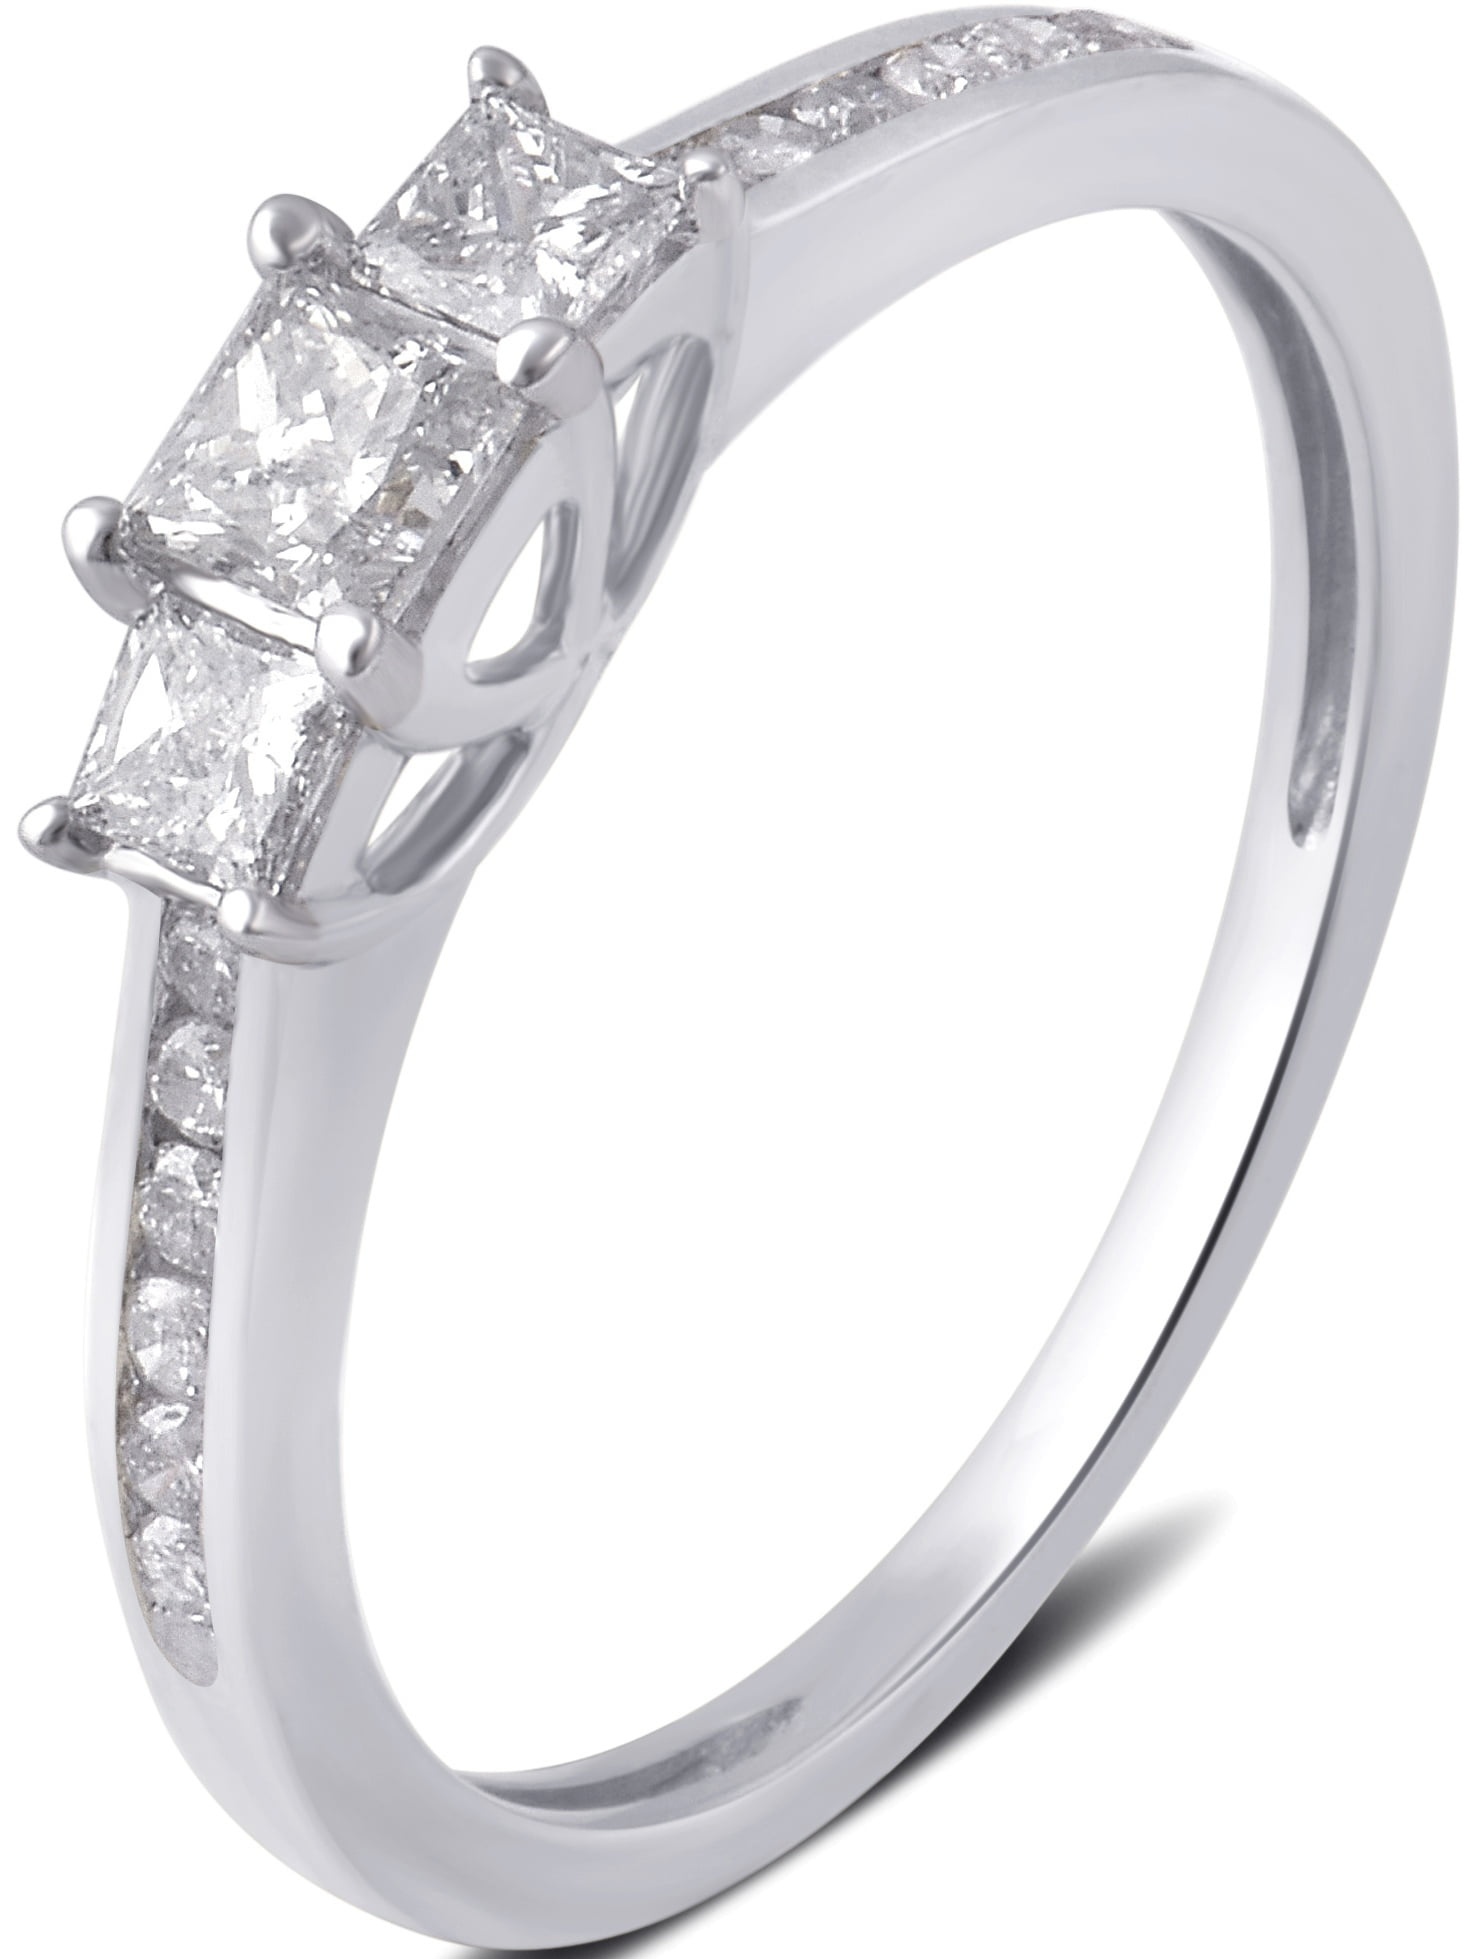 1 2 Carat T.W. 3 stone Princess Diamond 10K White Gold Engagement Ring by Generic